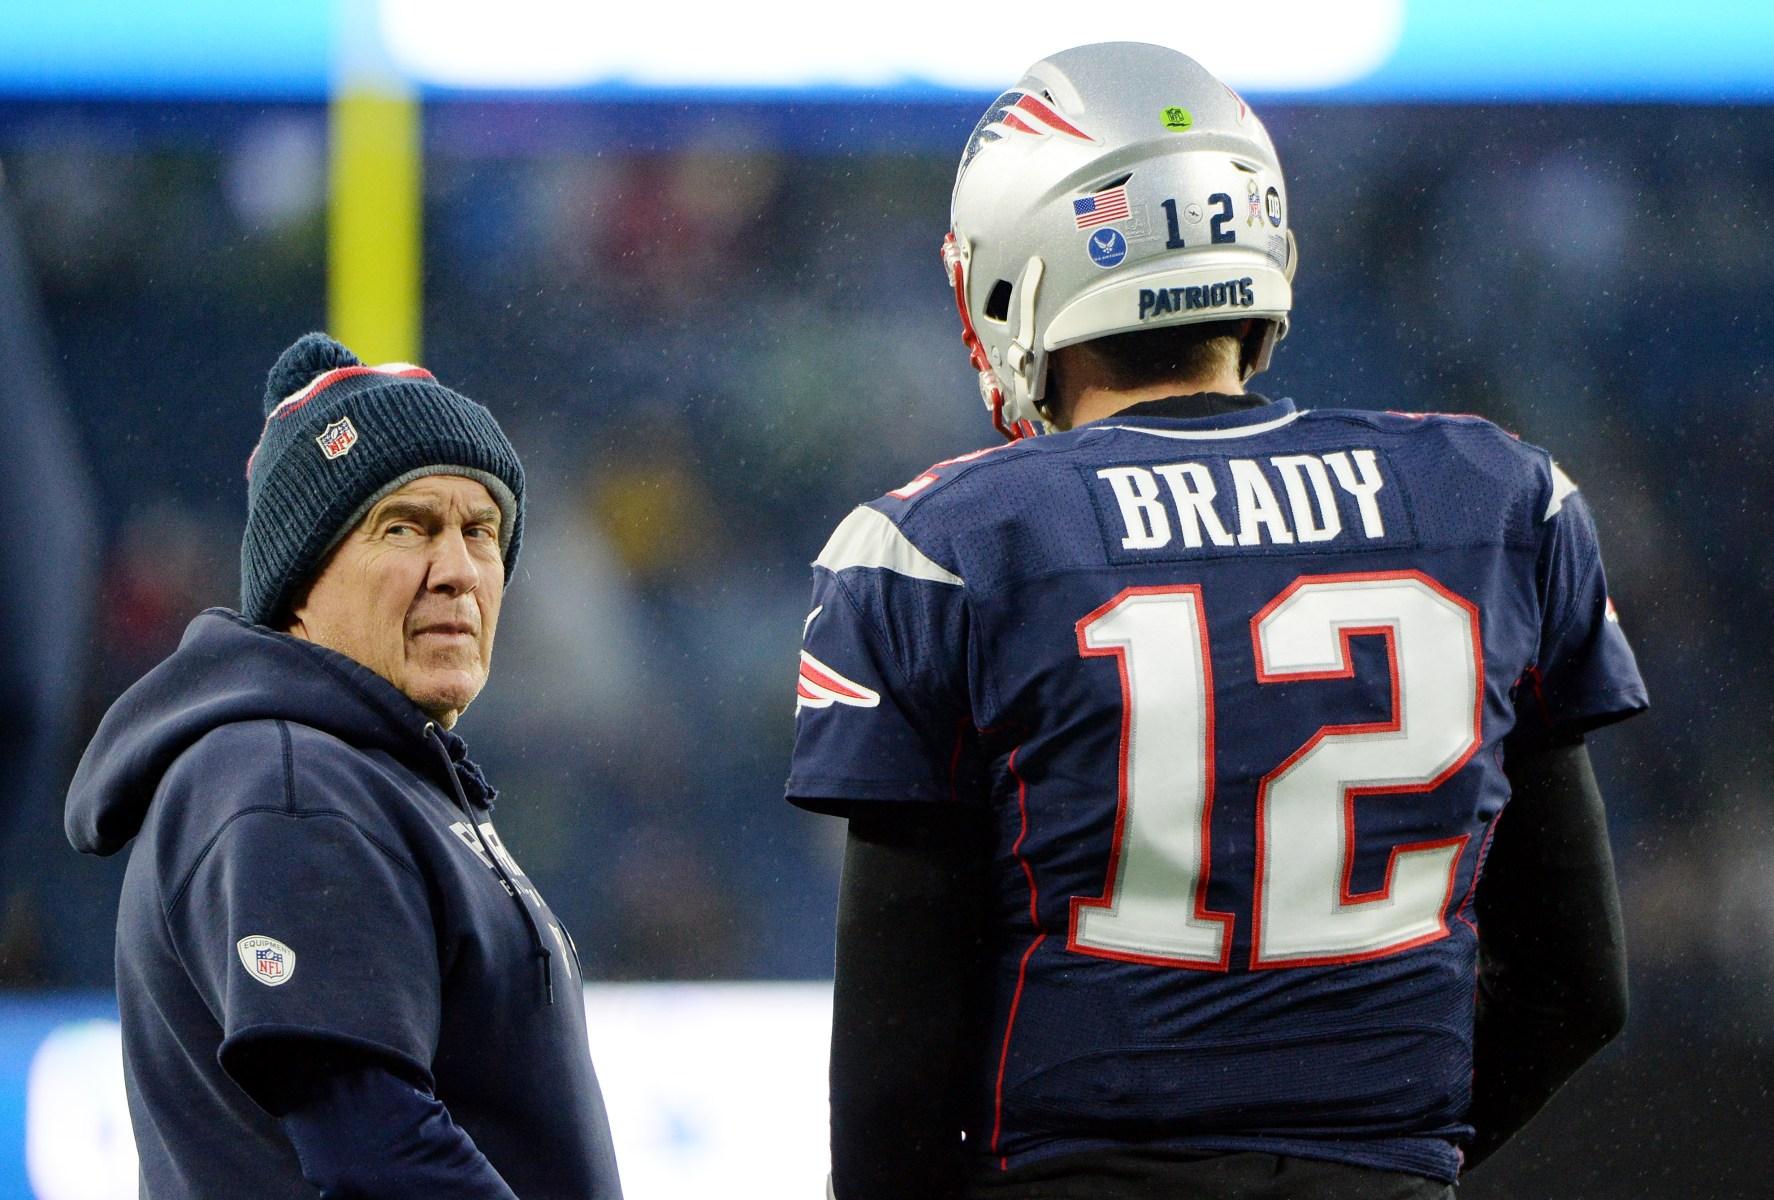 ESPN Is Fueling the Civil War Between Bill Belichick and Tom Brady